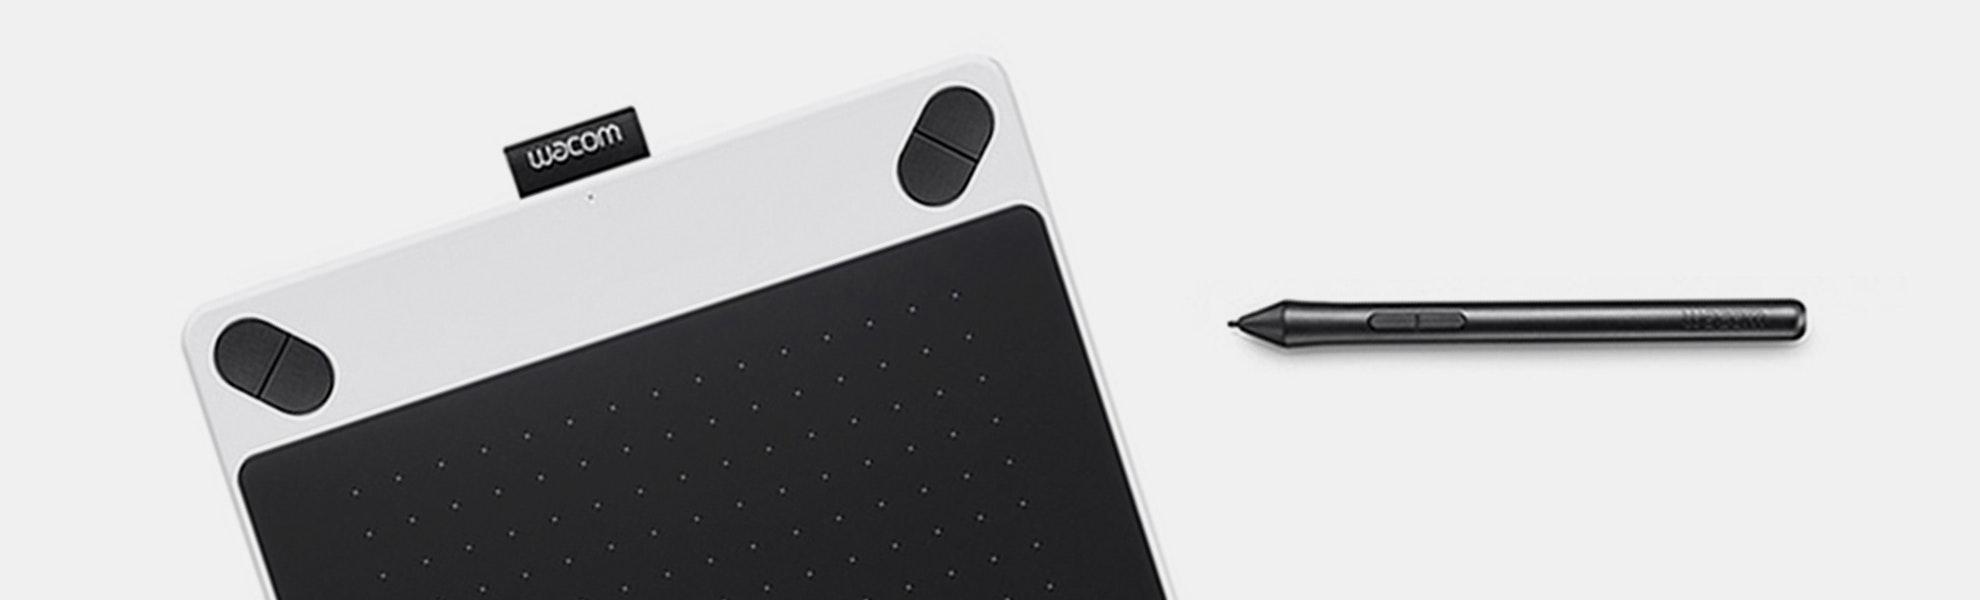 Wacom Intuos Draw Creative Pen Tablet Price Reviews Massdrop